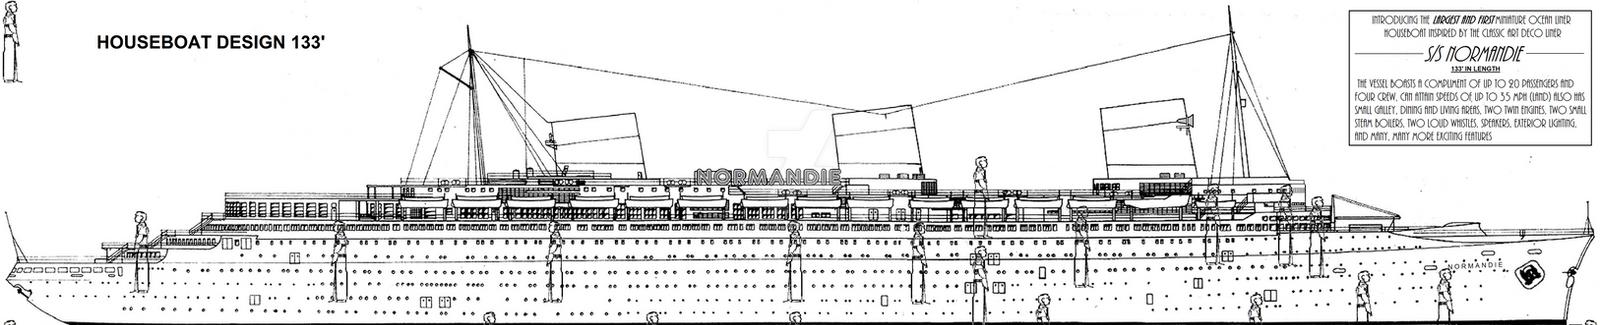 Houseboat Design SS NORMANDIE by mdstras on DeviantArt